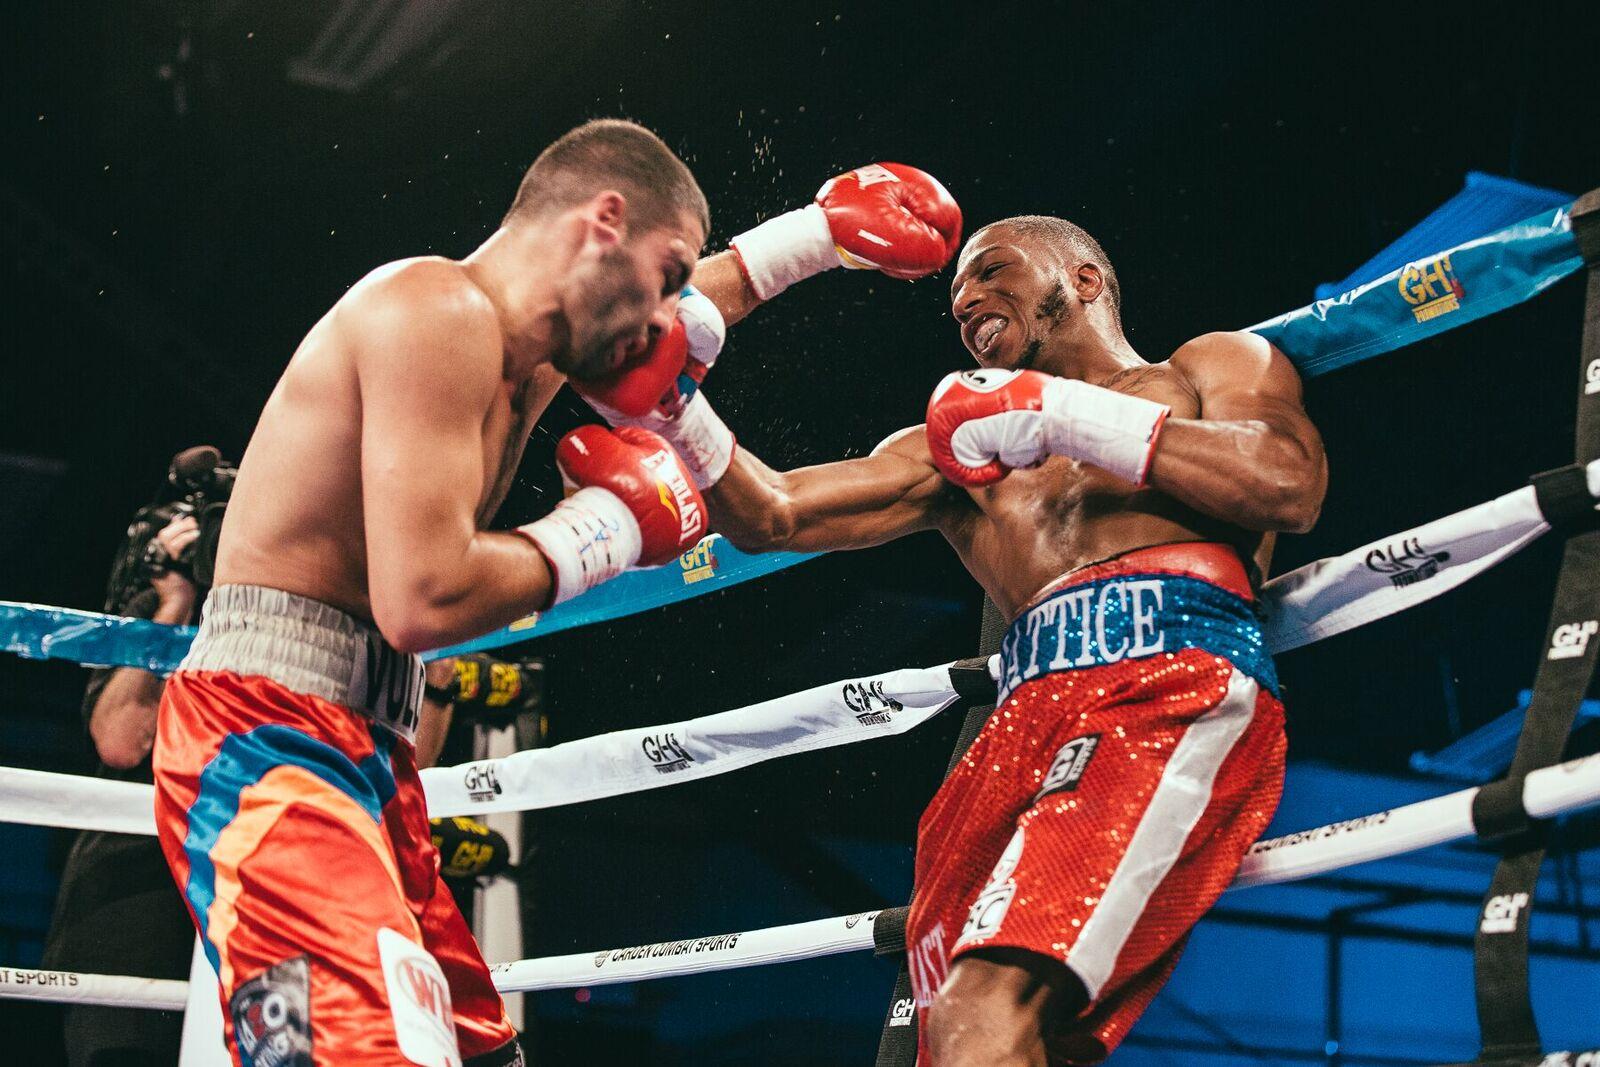 Lightweights Thomas Mattice (right) and Zhora Hamazaryan. Photo credit: Rosie Cohe/Showtime